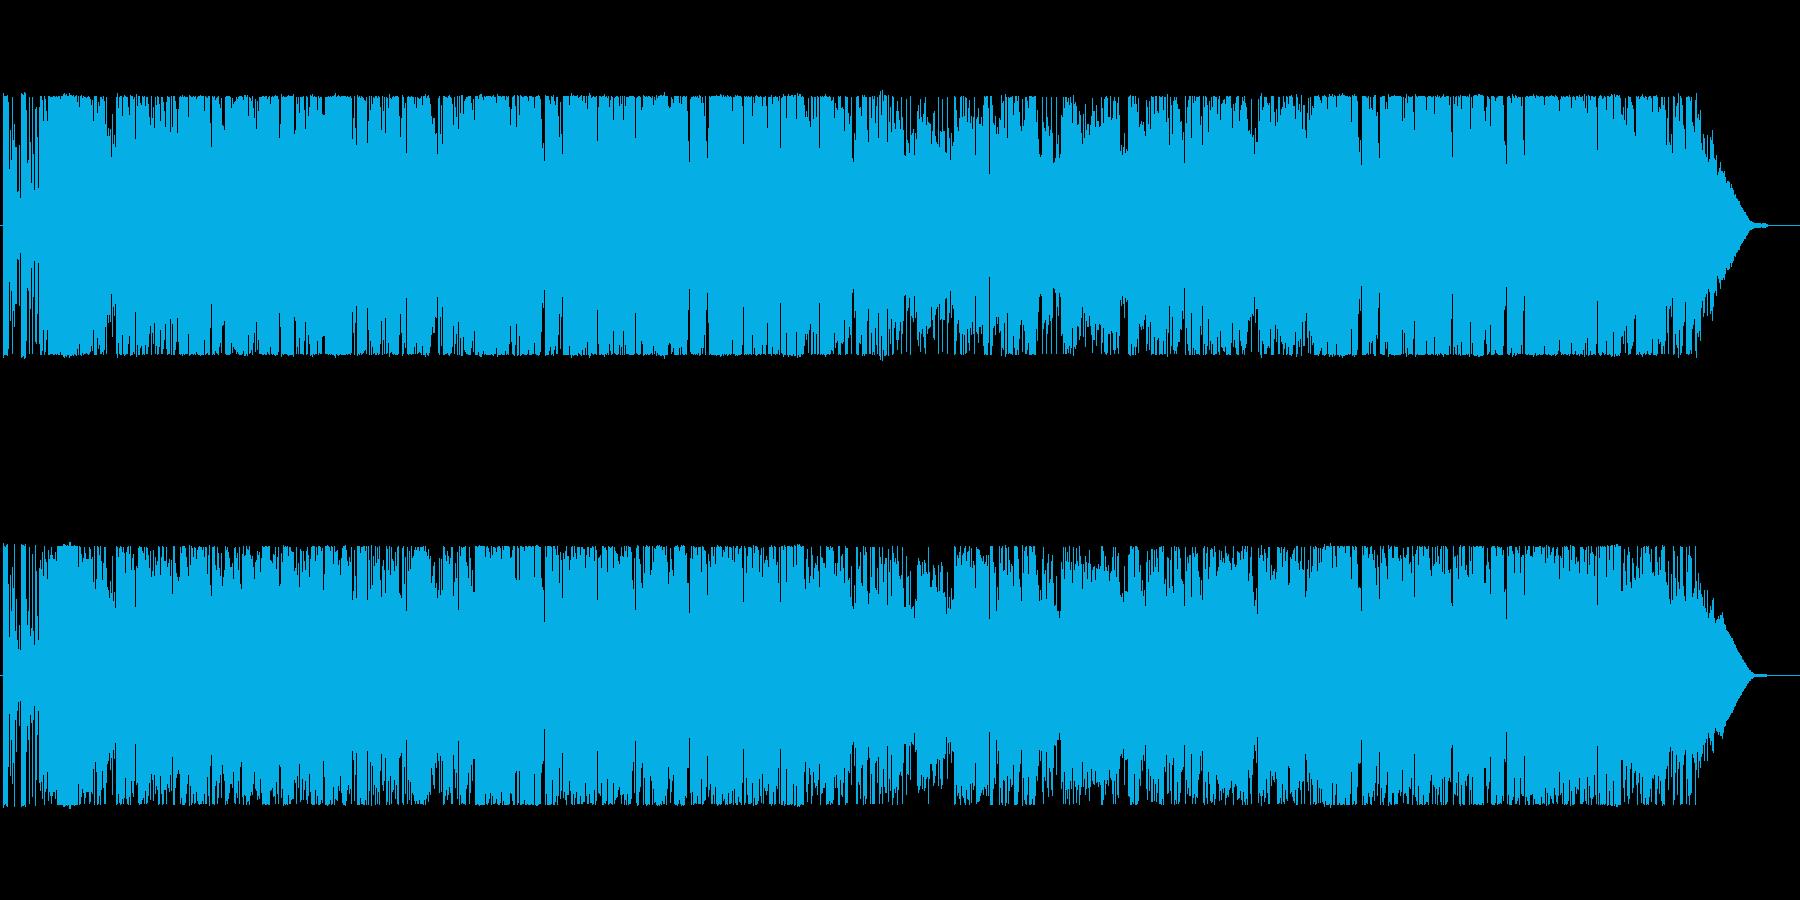 BigBand風の明るくて軽快なPOPSの再生済みの波形